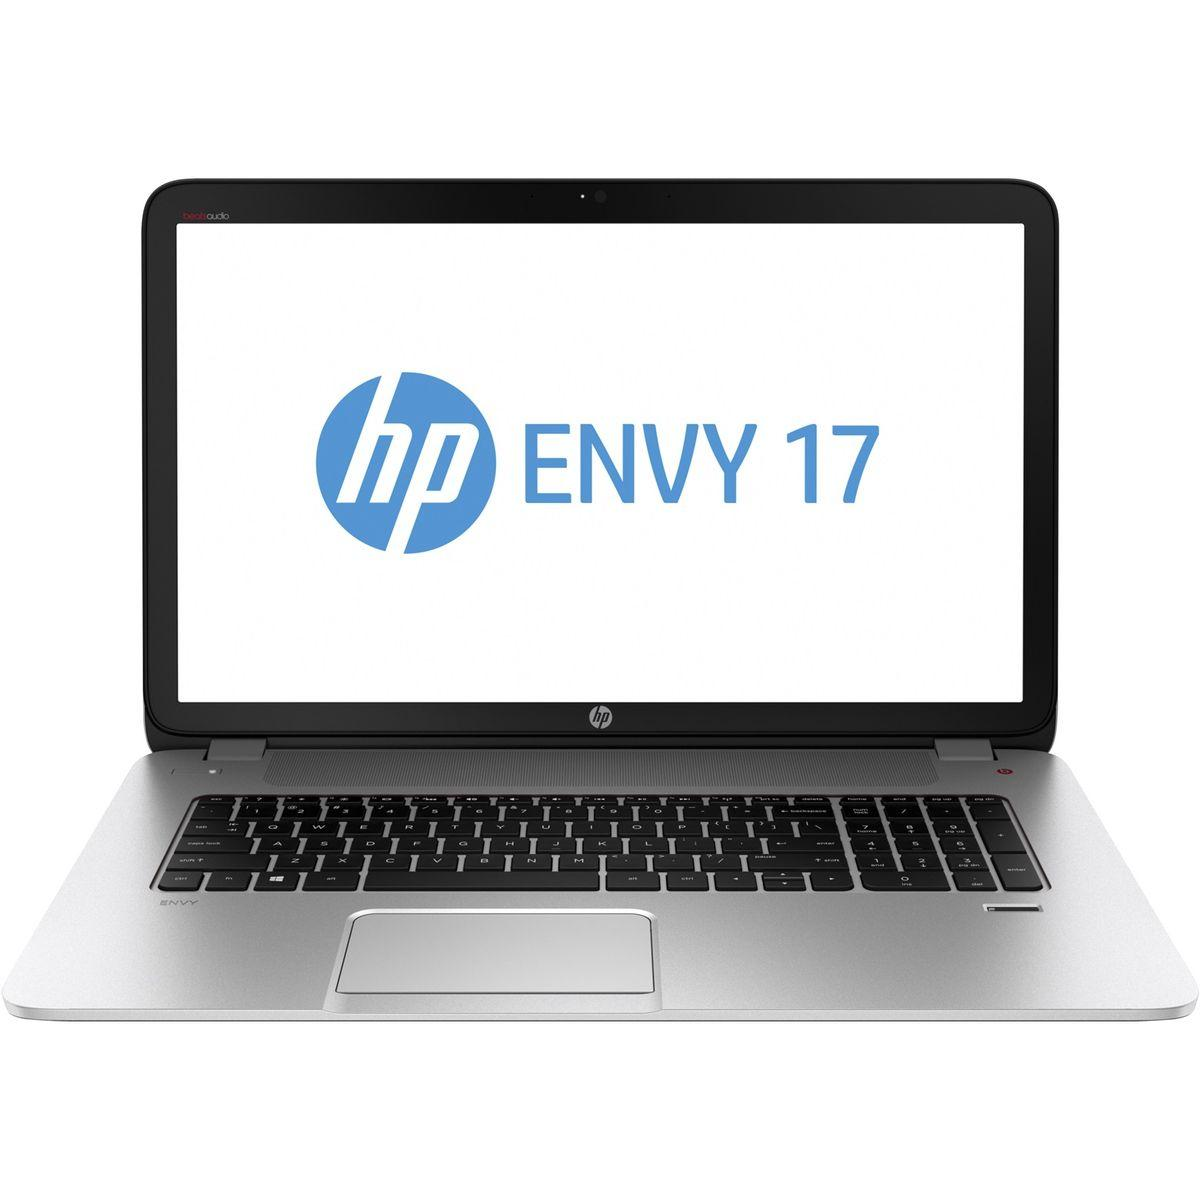 "Hewlett Packard 17-J107NF 17,3"" Intel Core i7-4710MQ 2.5 GHz GHz  - HDD 1 To - RAM 8 Go"